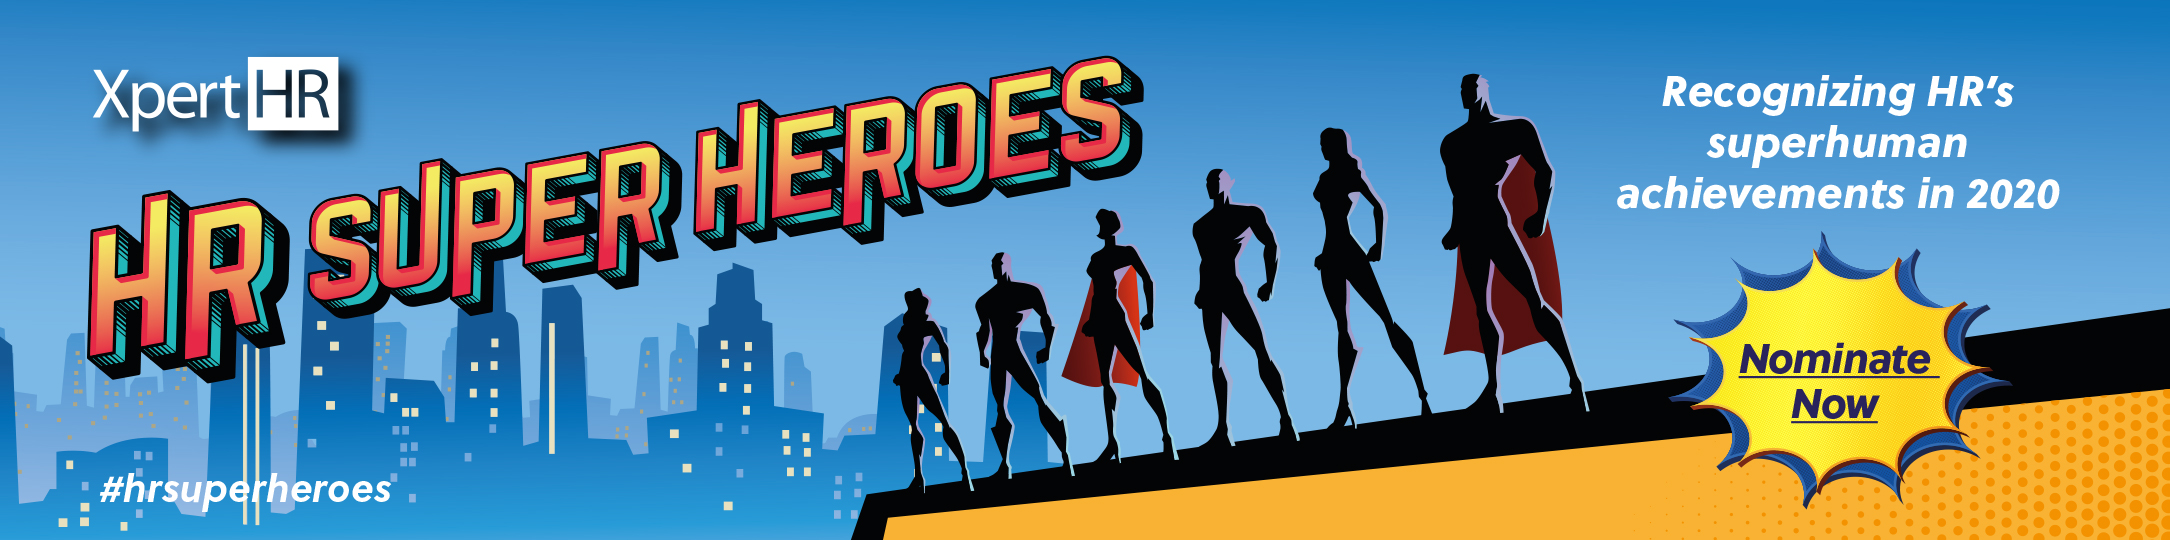 XP Heroes banner